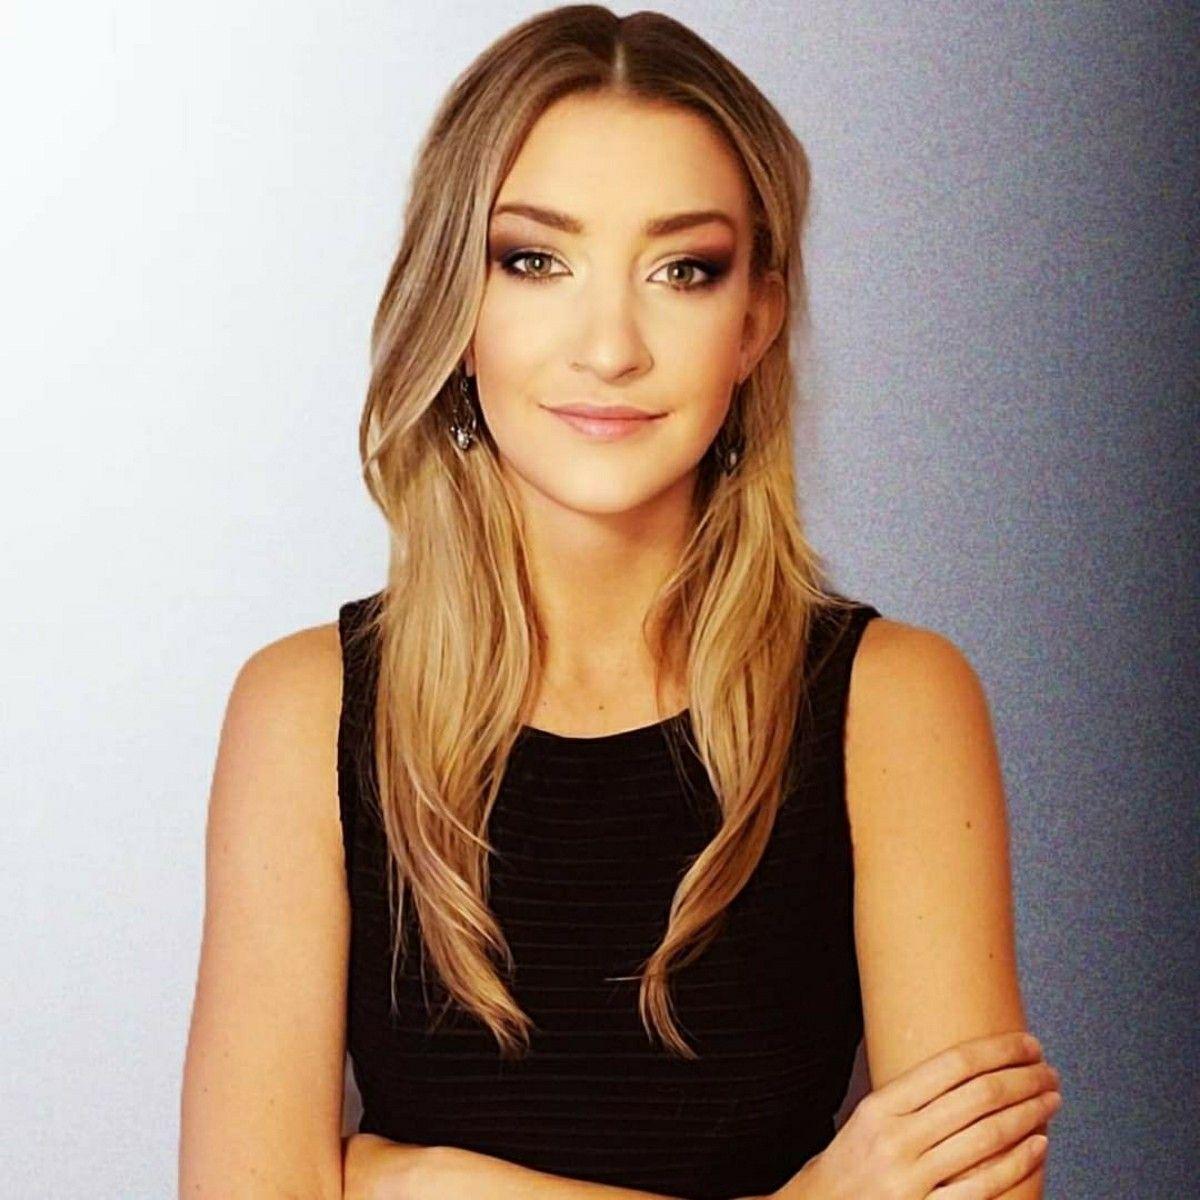 Megan Lee Podsiedlik